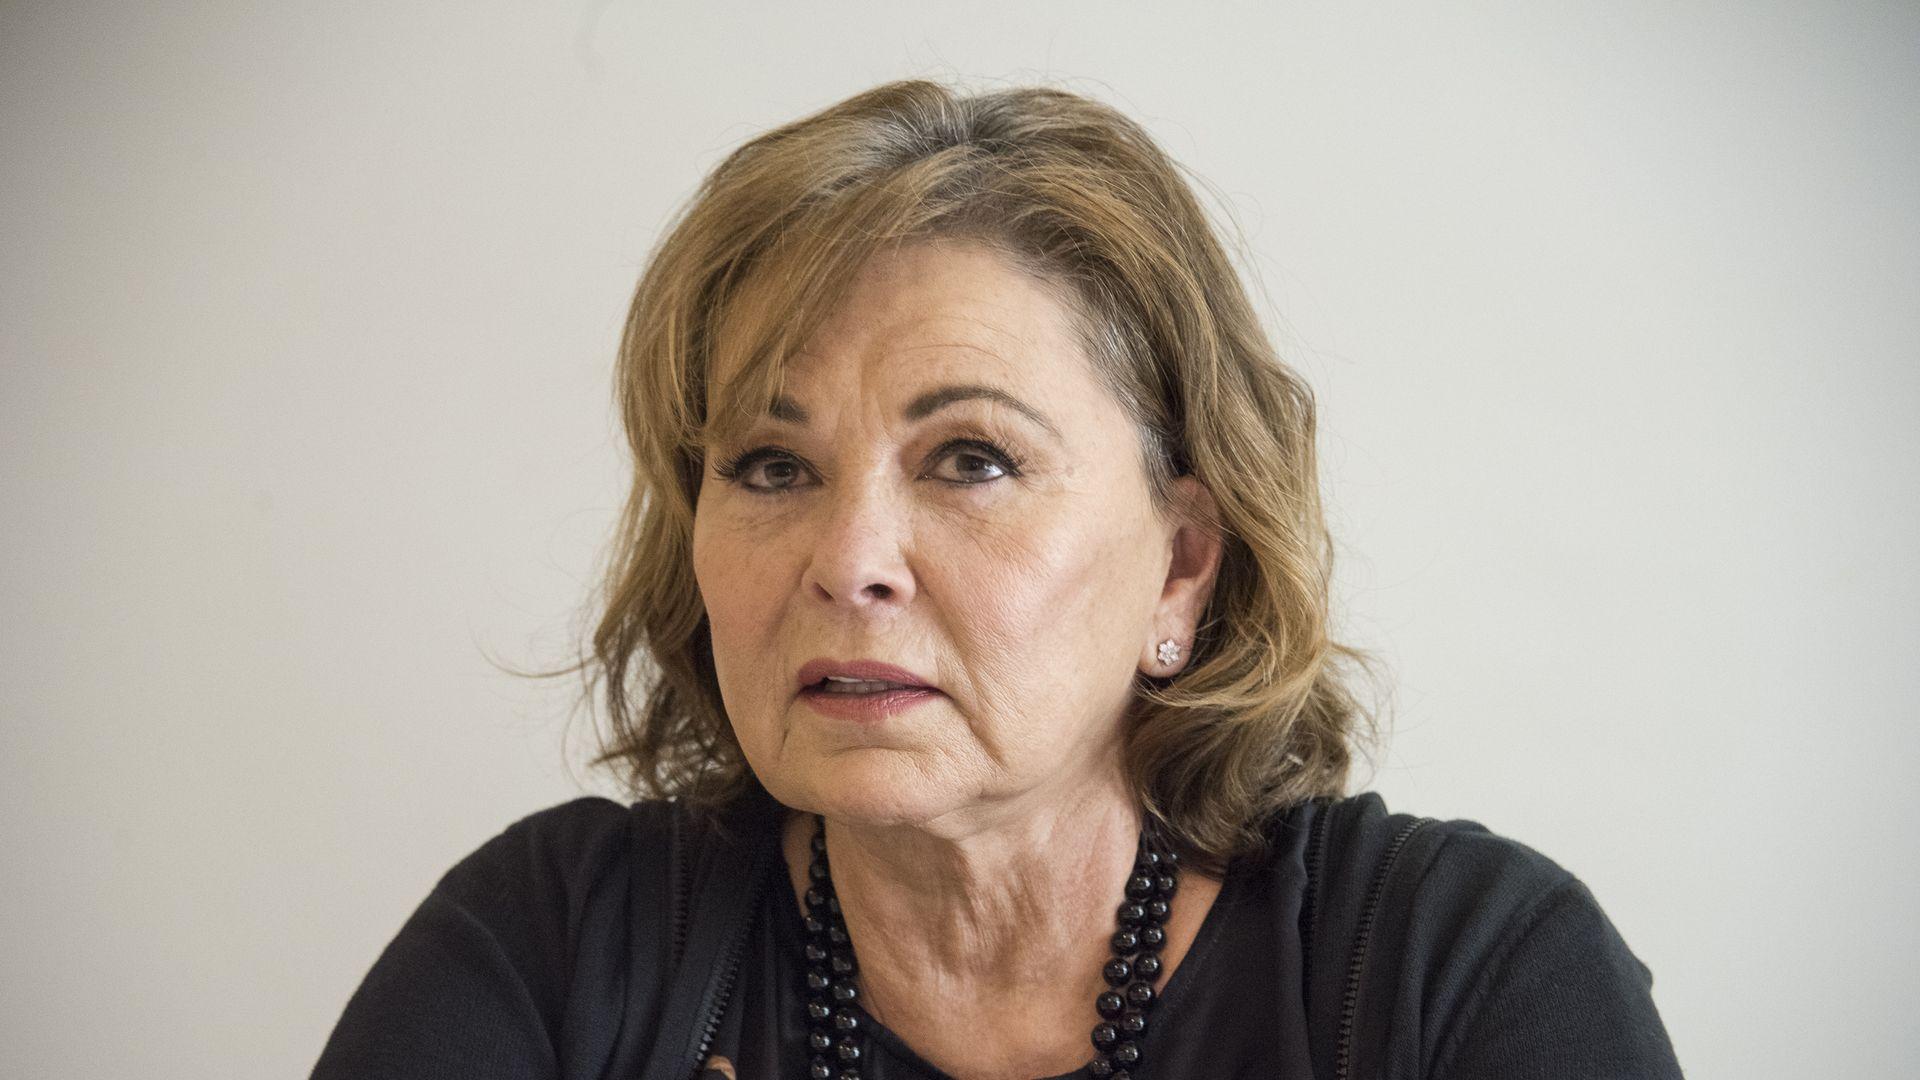 Rosanne Barr